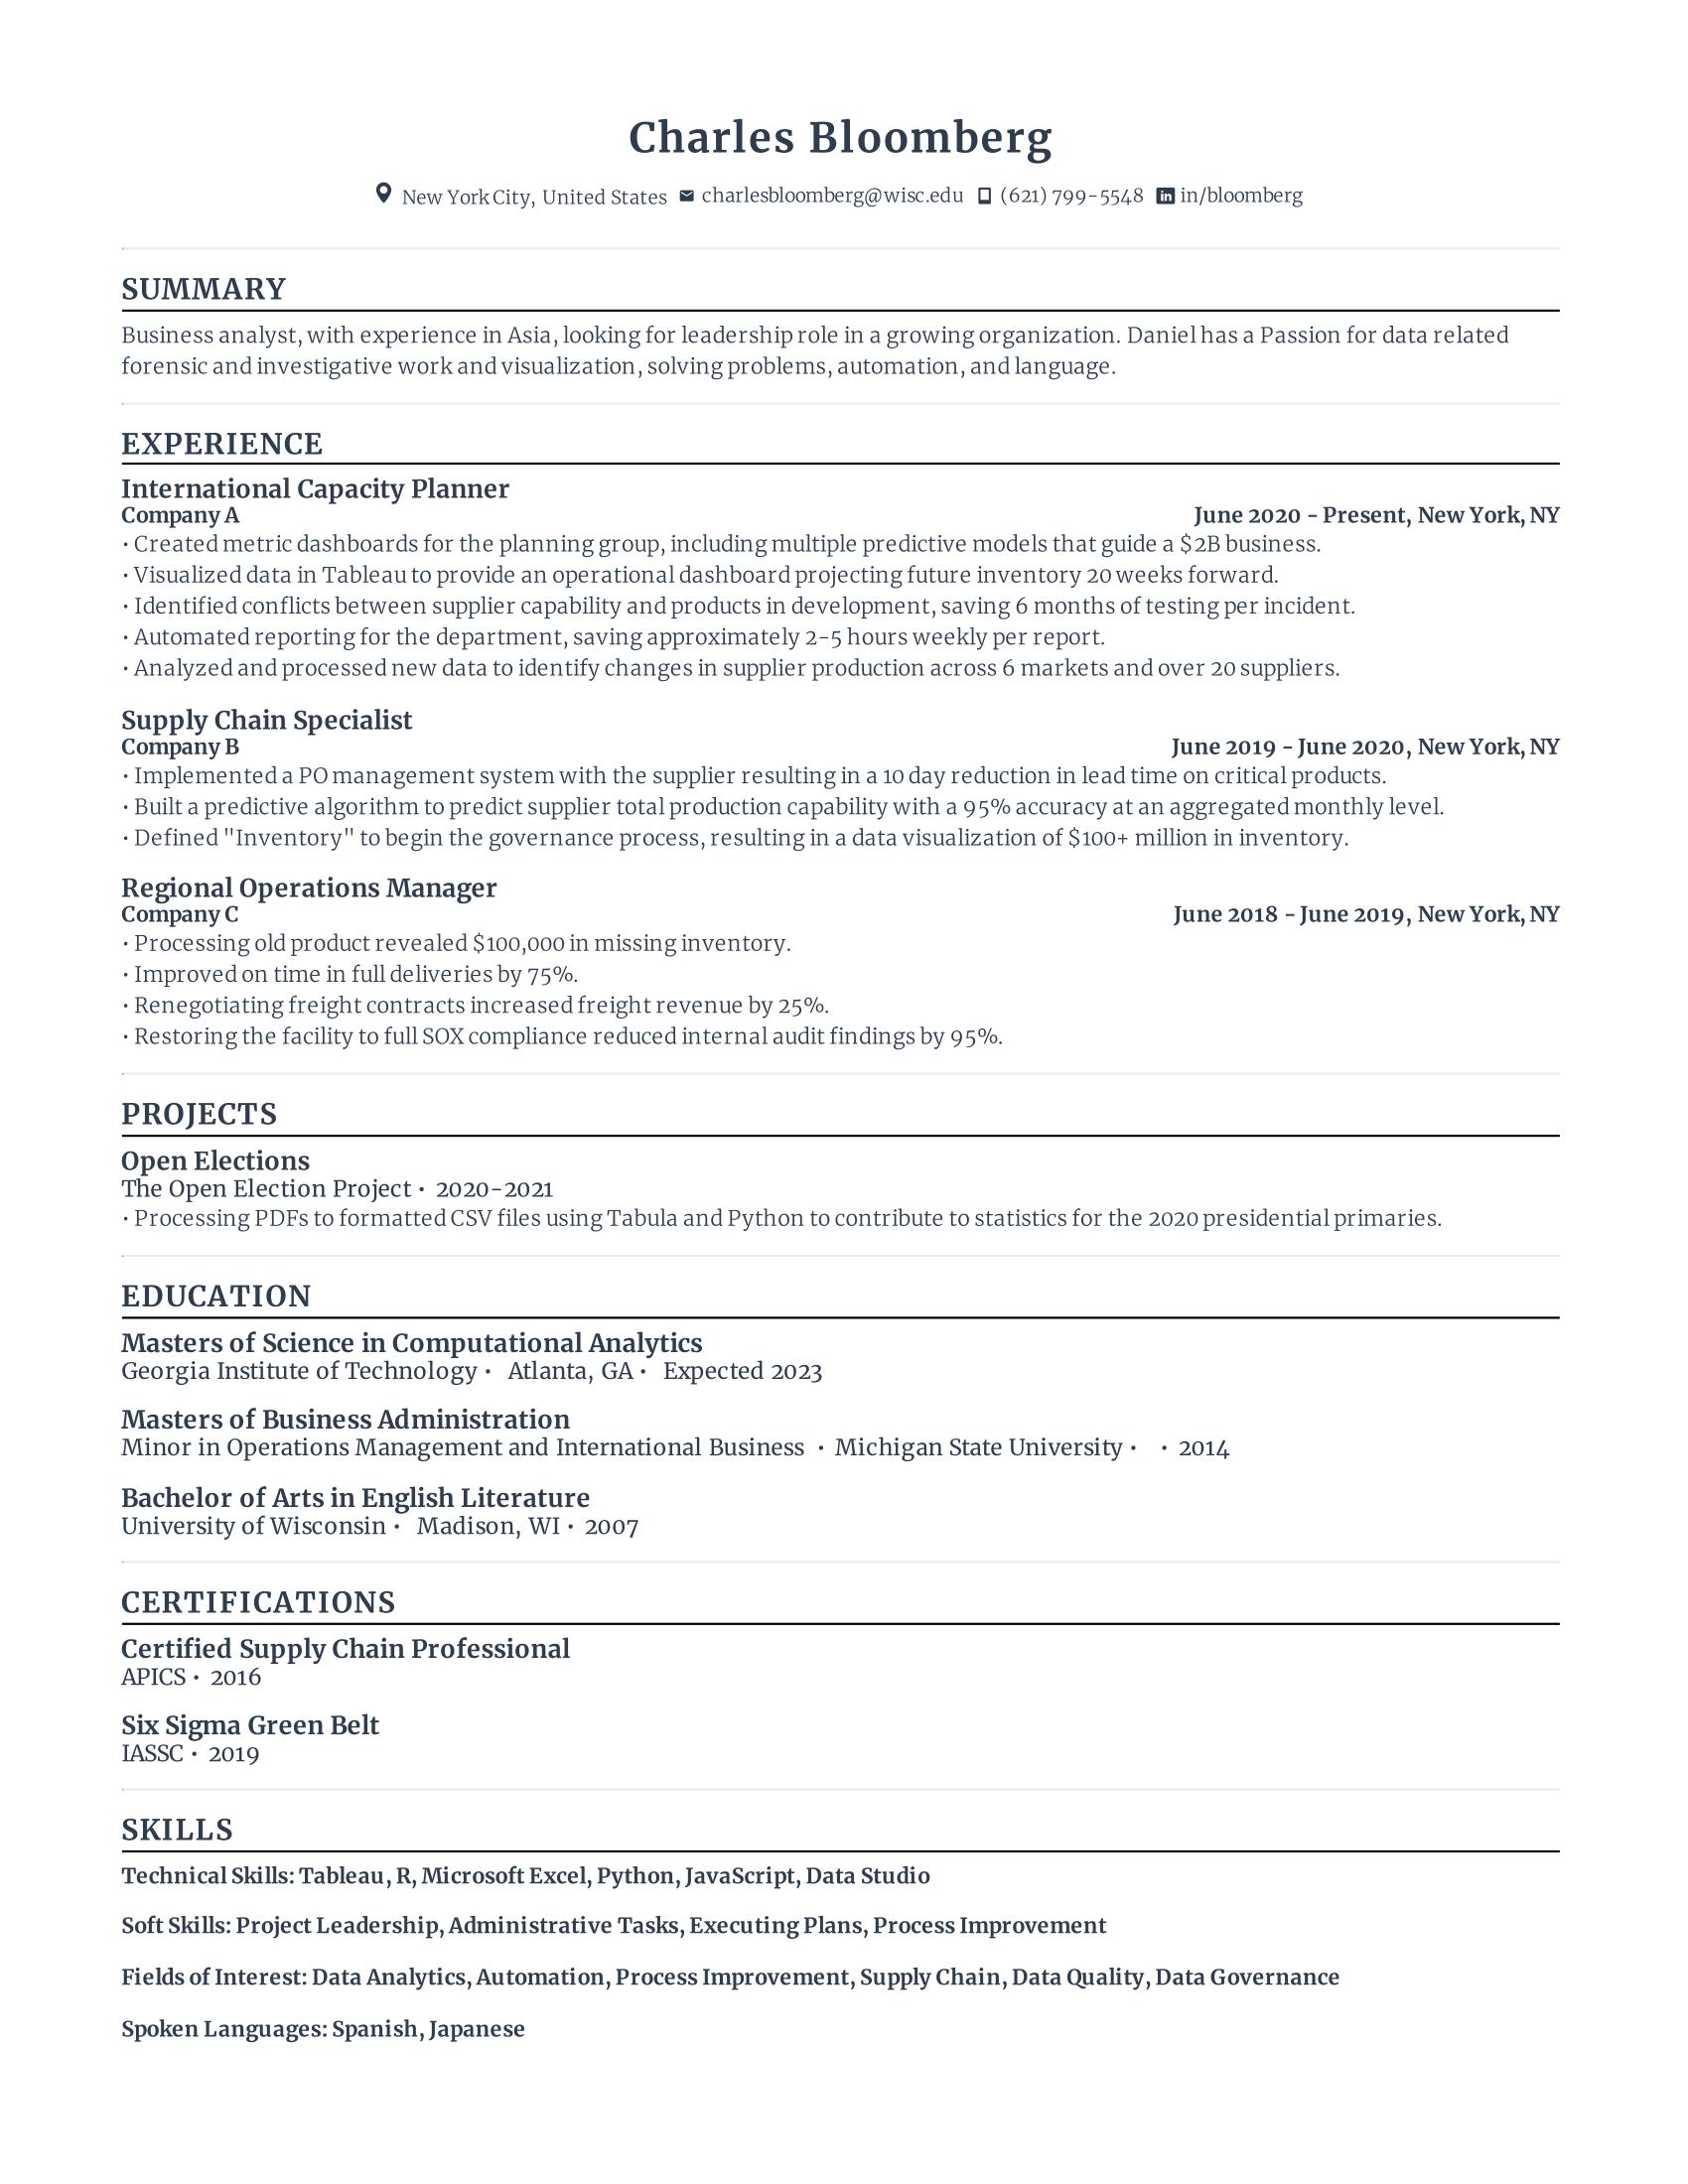 Resume Skills for Database Administrator Example